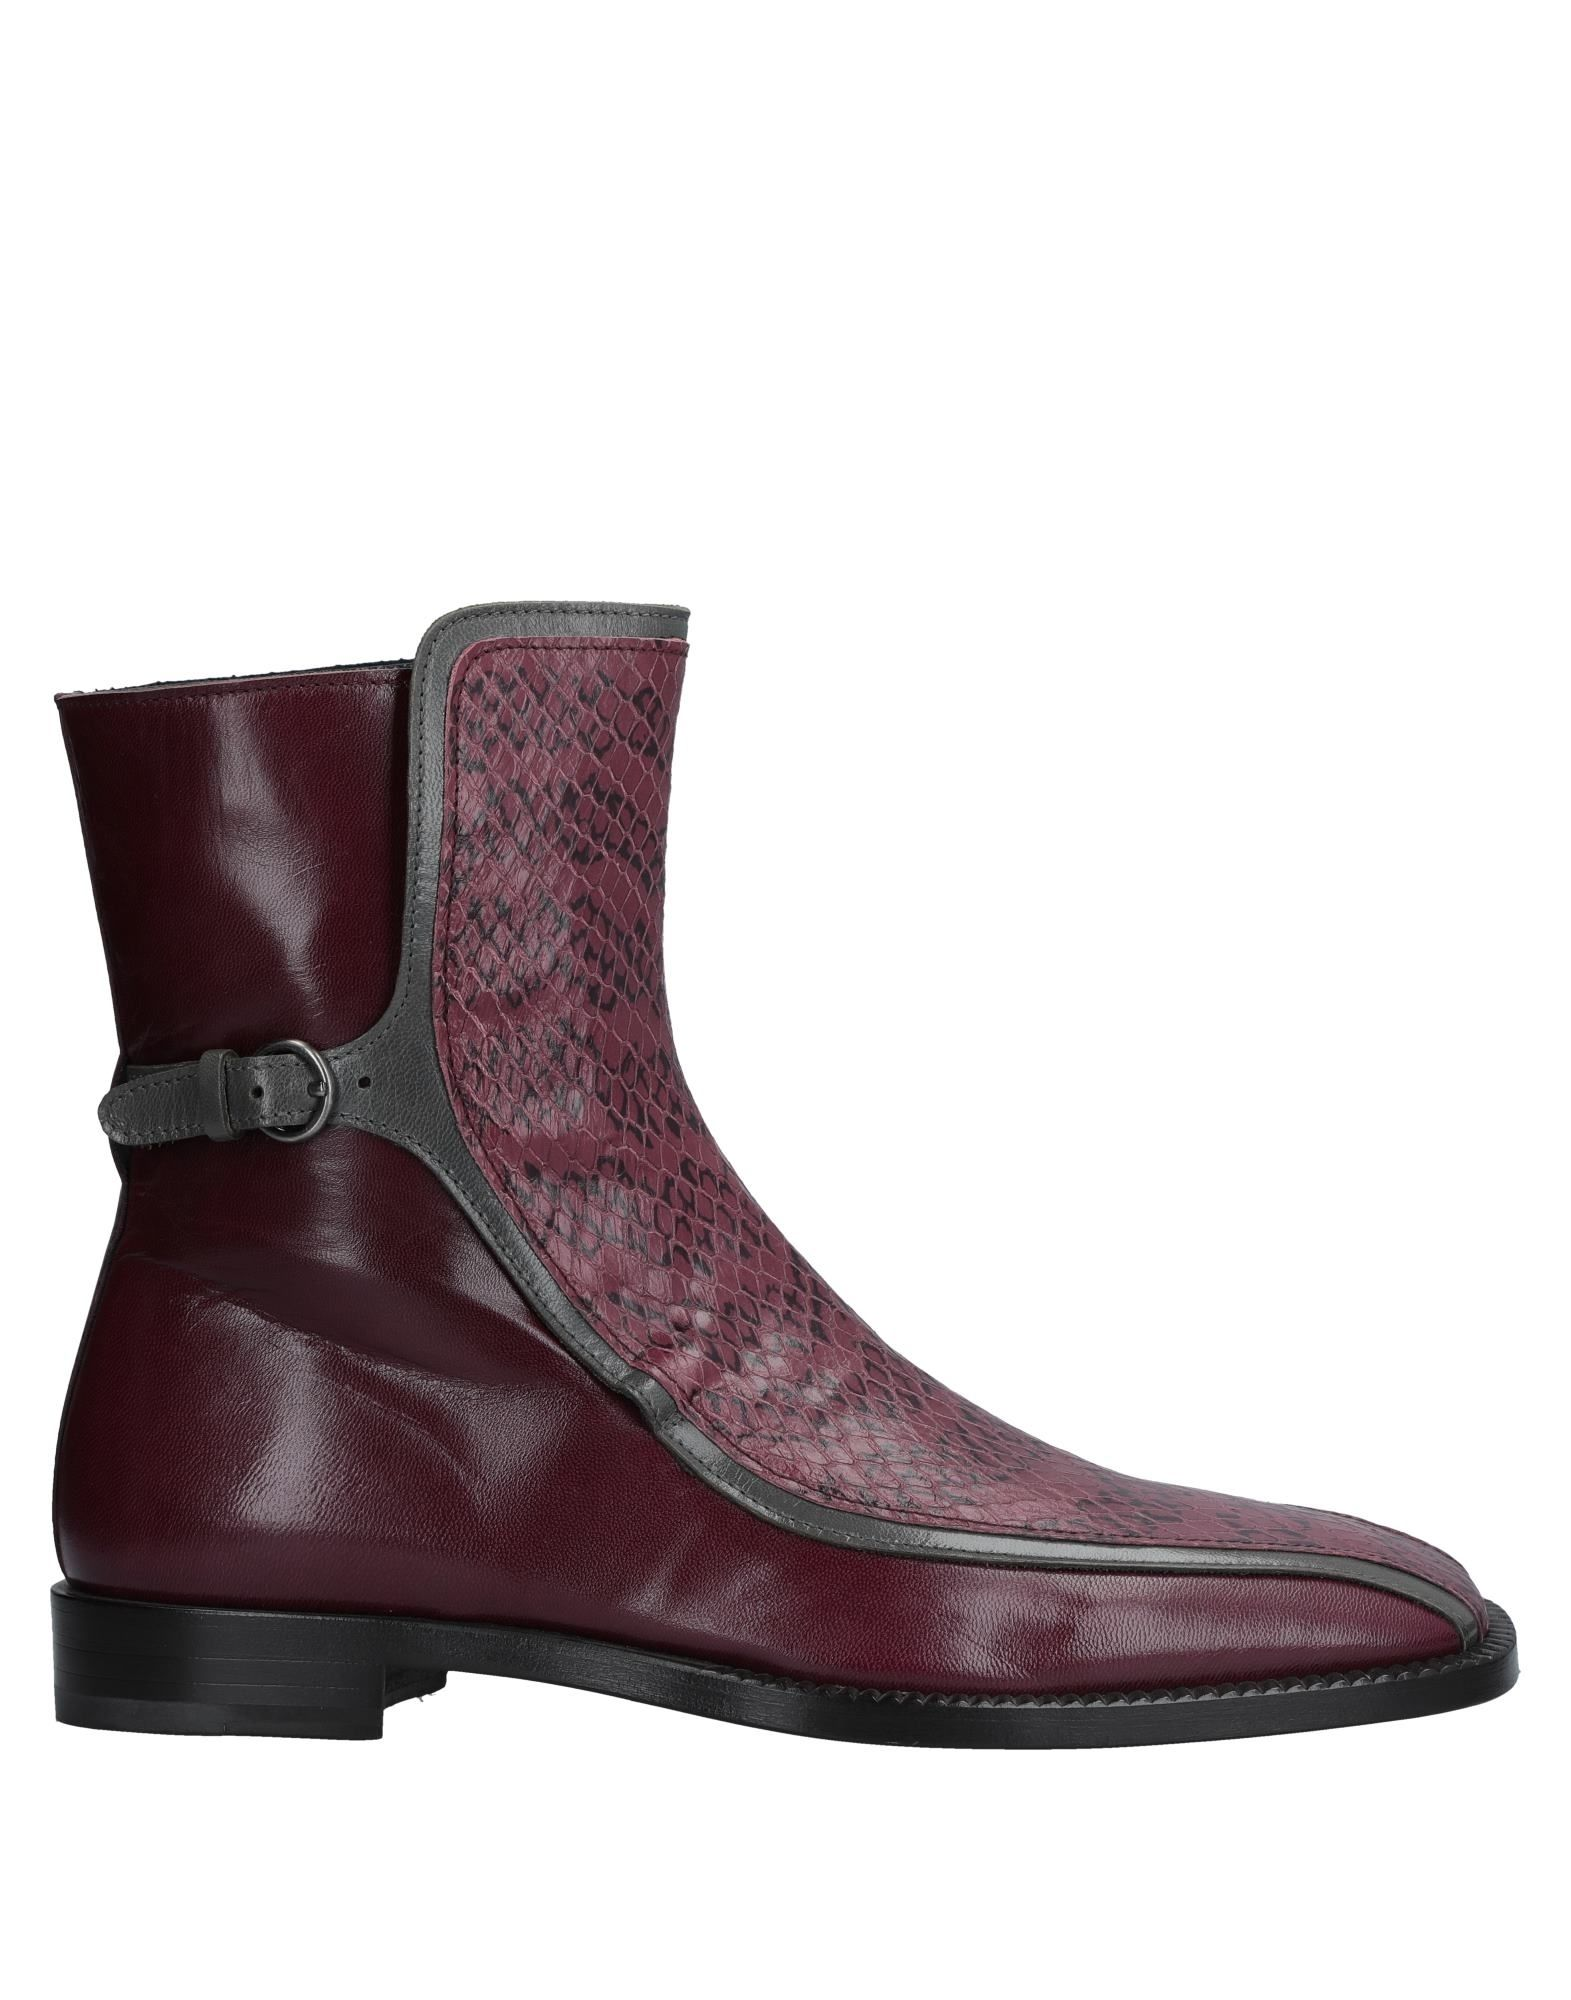 Miu Miu Stiefelette Herren  11538417MC Gute Qualität beliebte Schuhe